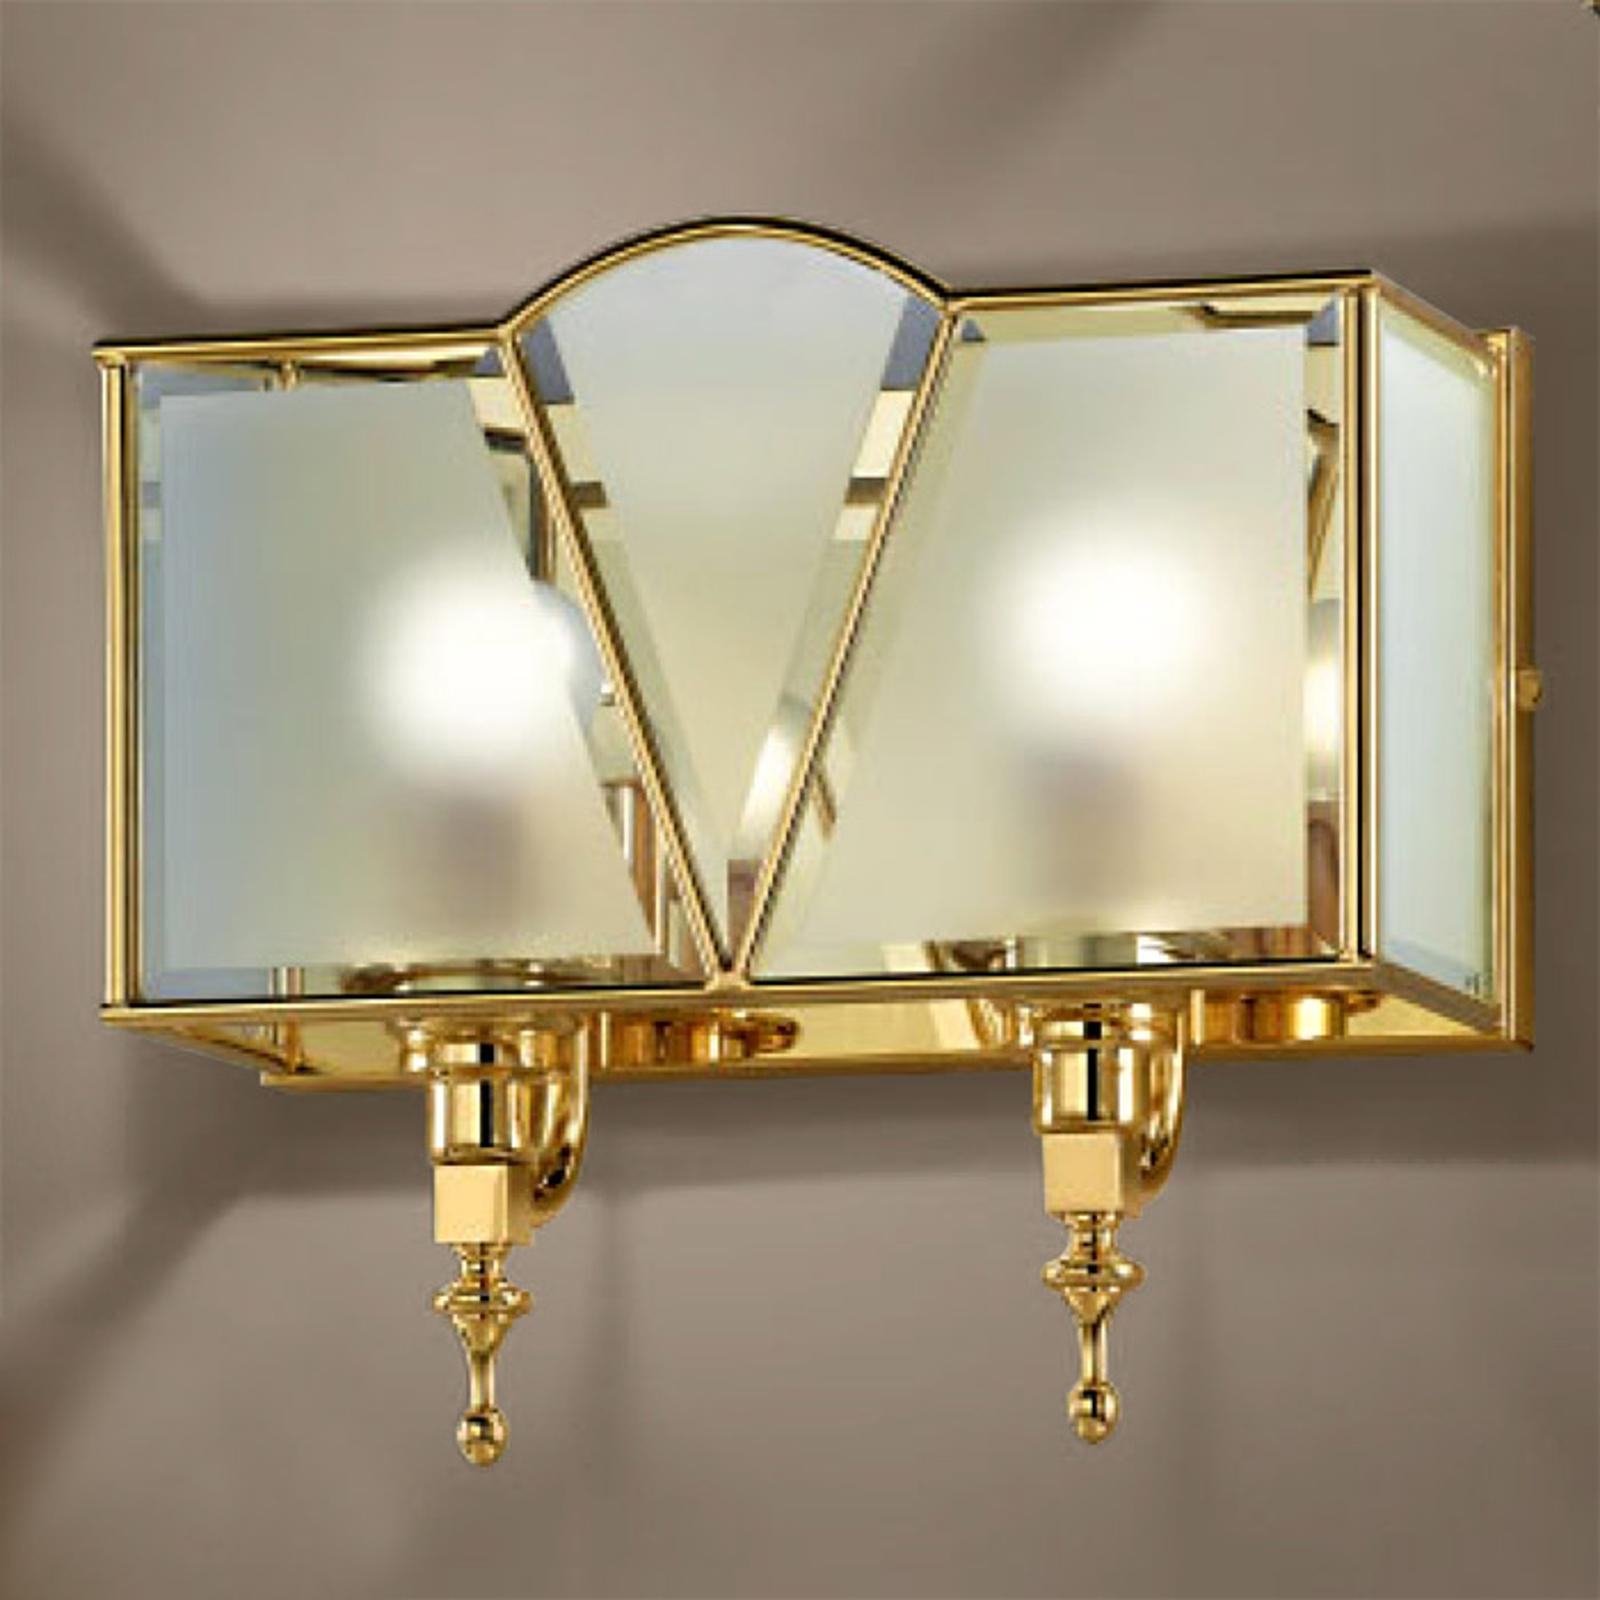 2-lichts wandlamp Classic goud